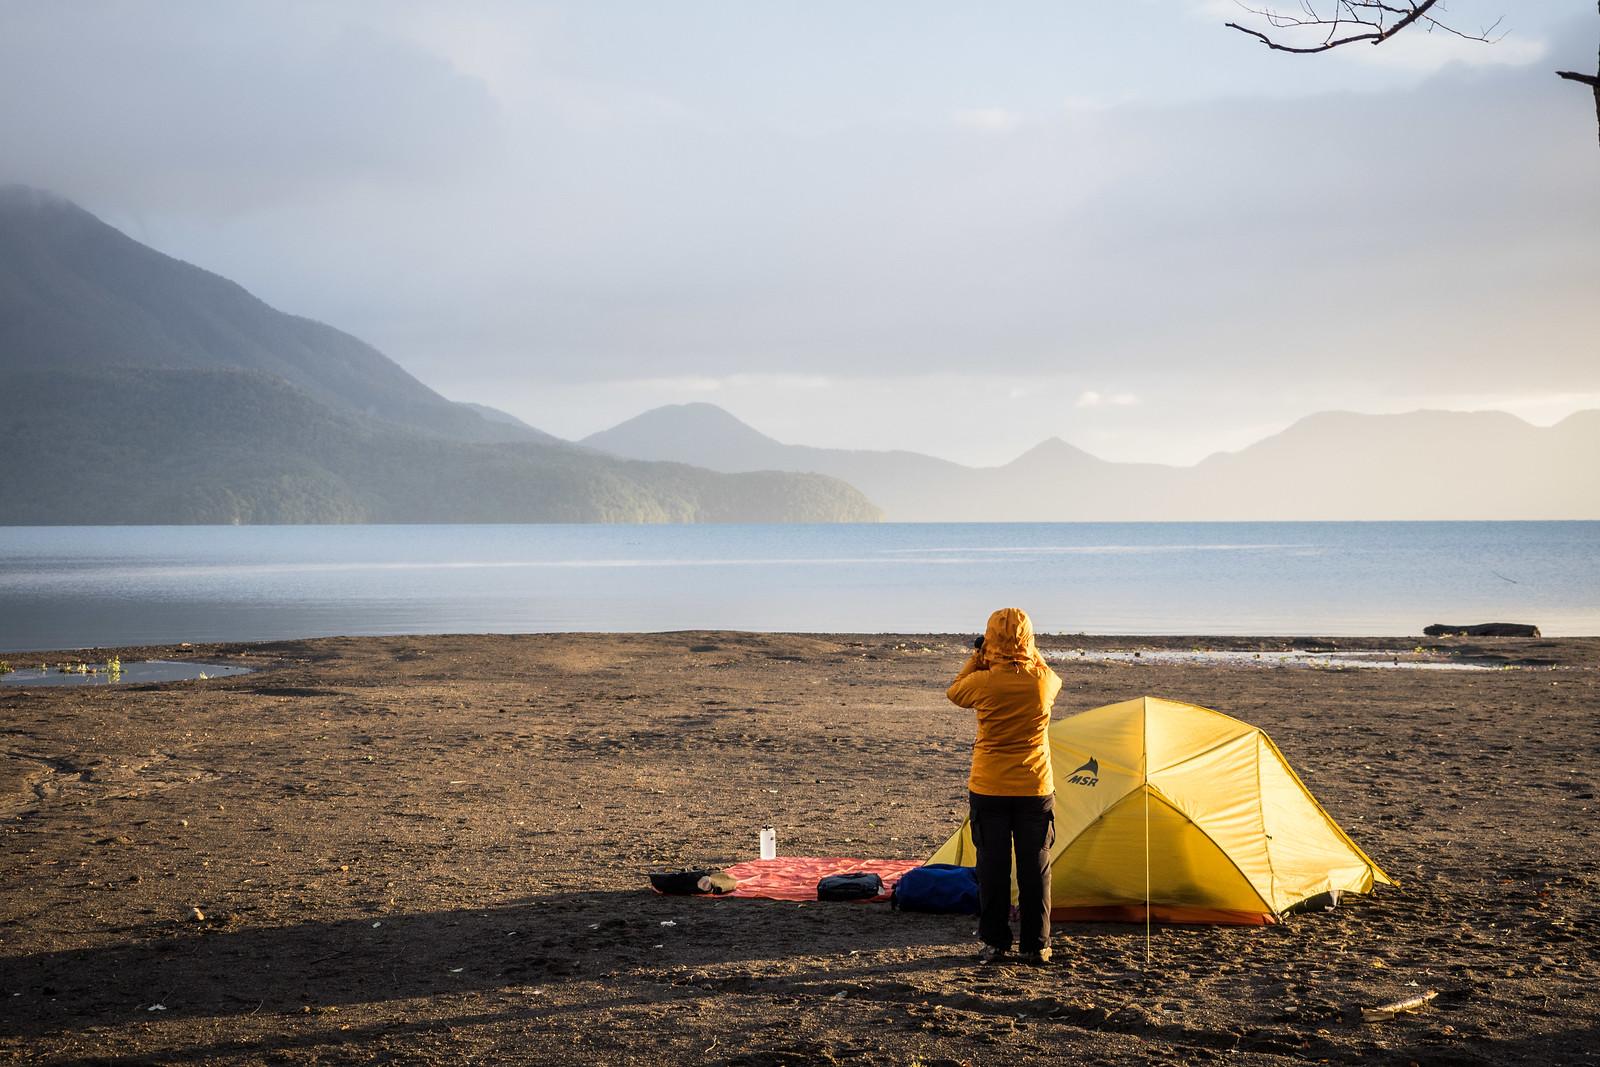 Camping at the Bifue Campground on Lake Shikotsu, Hokkaido, Japan